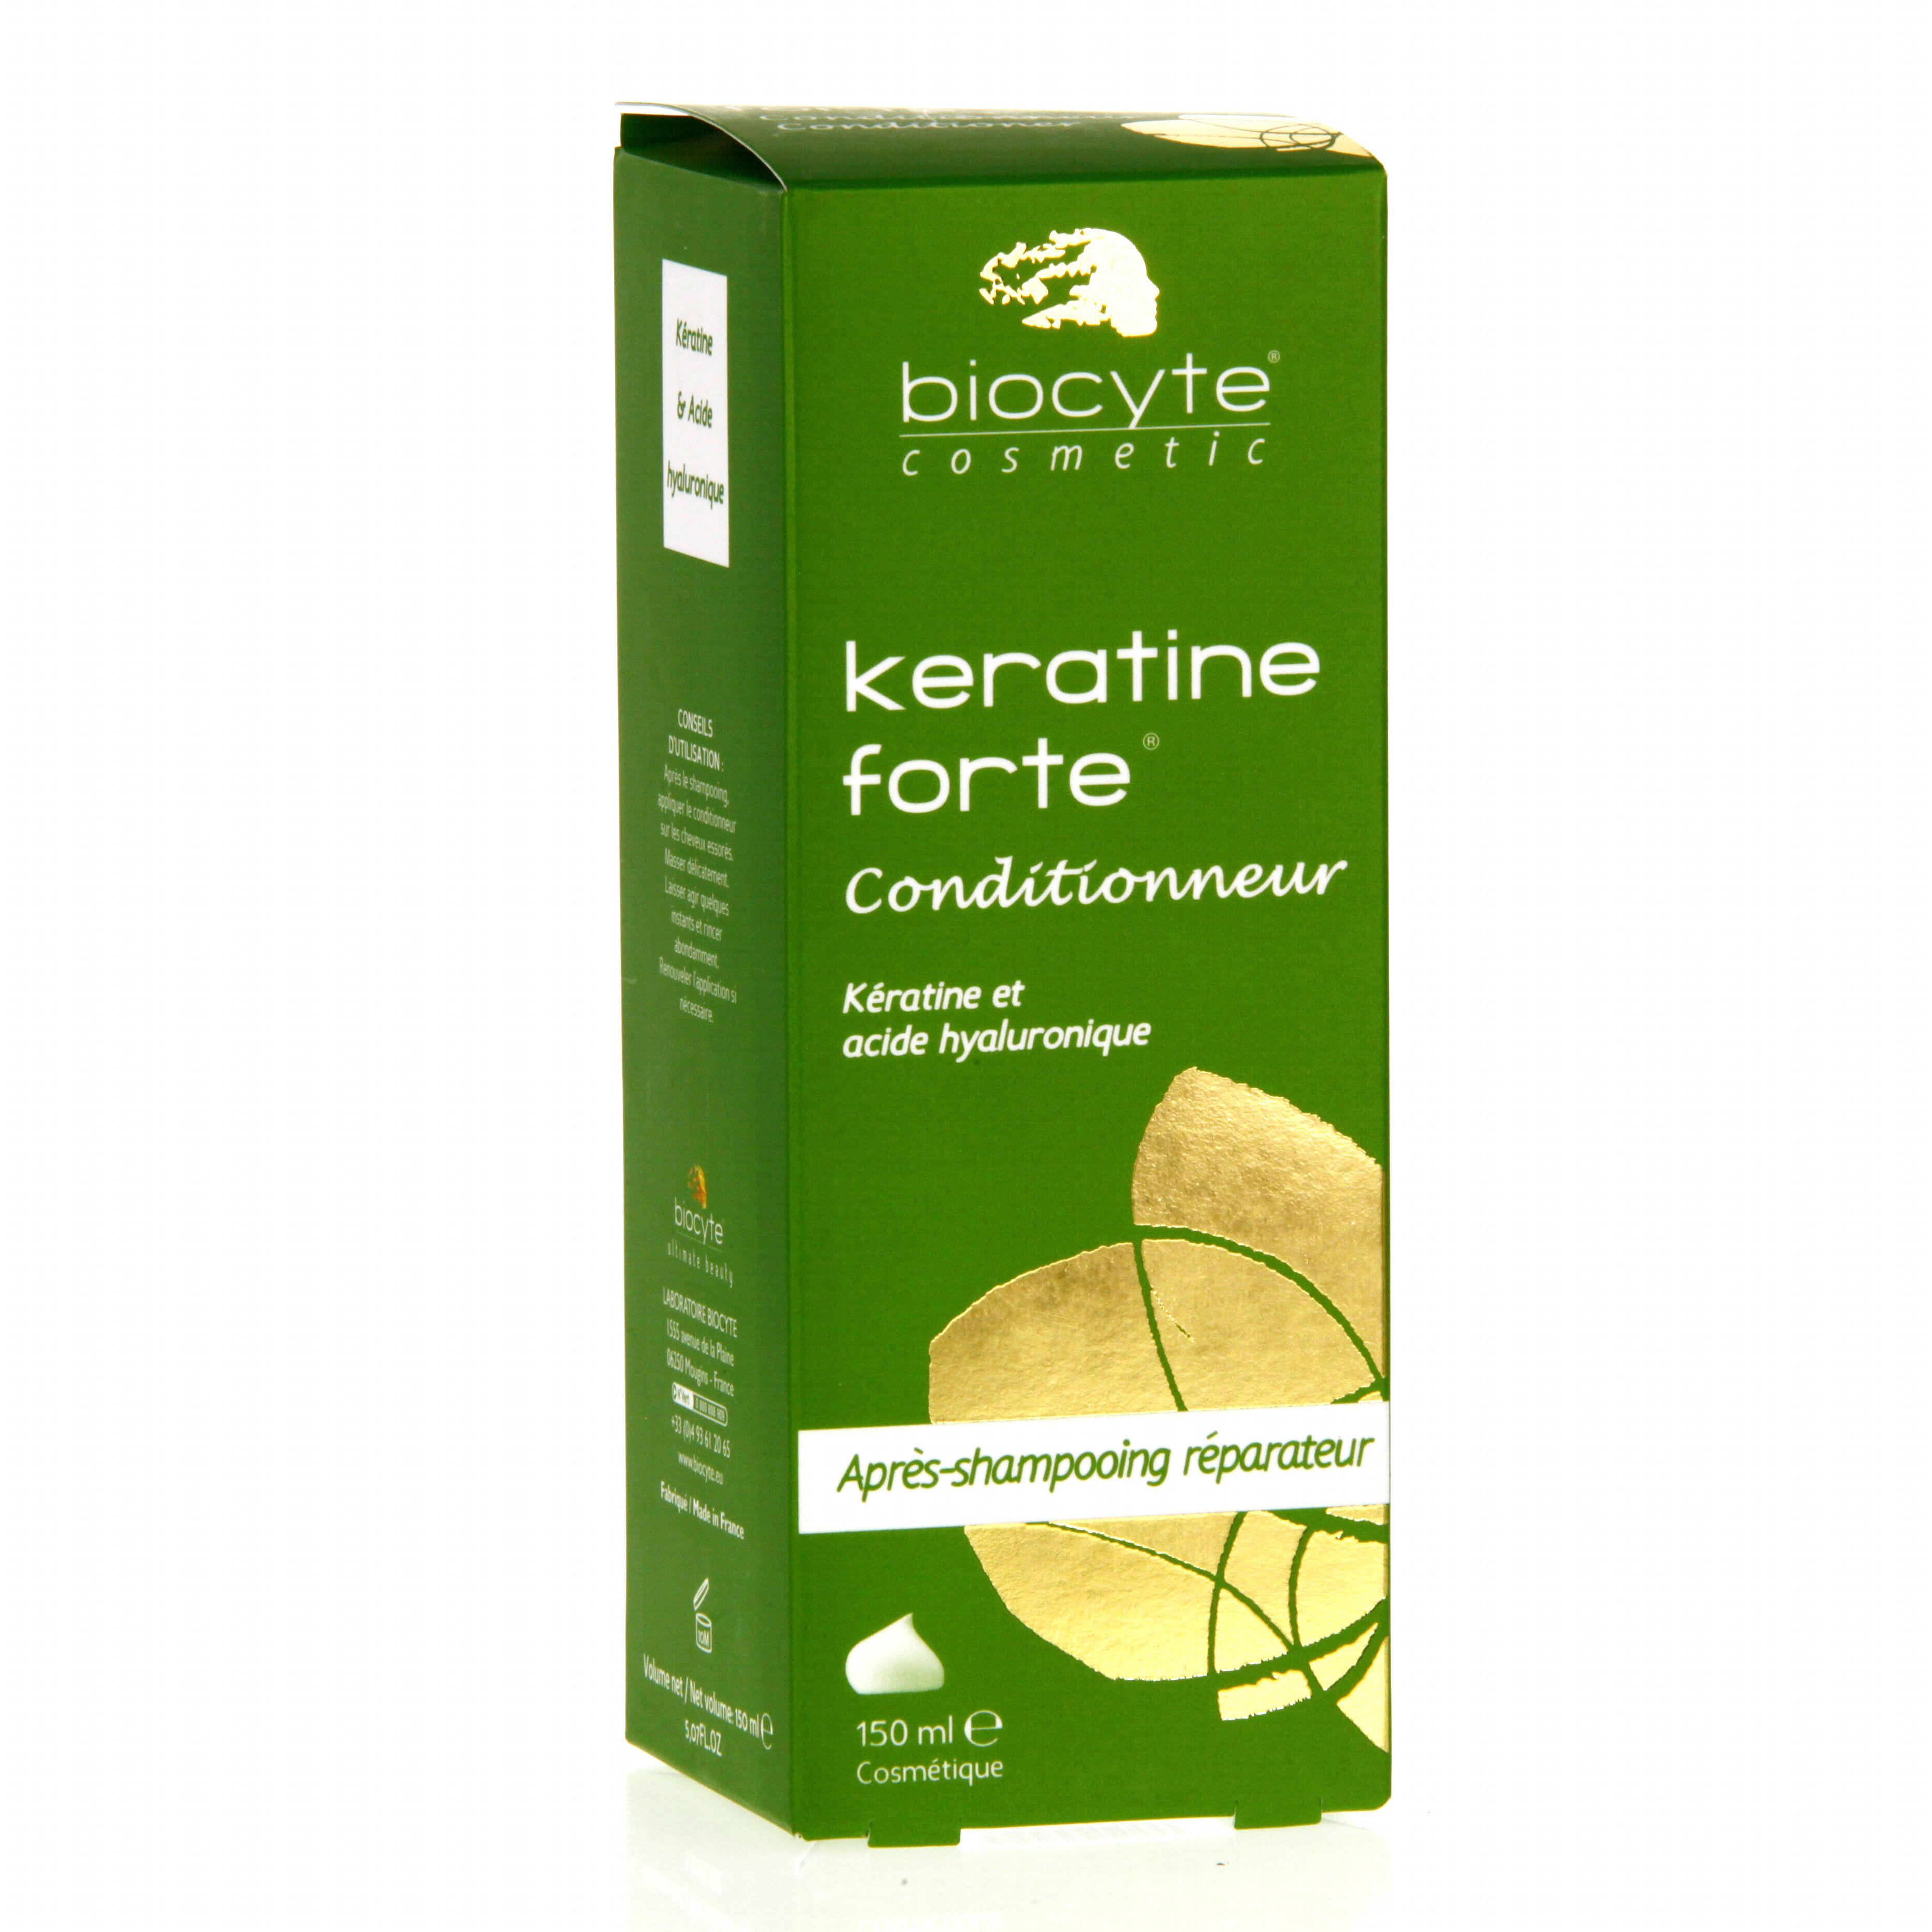 biocyte keratine forte conditionneur flacon 150ml parapharmacie en ligne prado mermoz. Black Bedroom Furniture Sets. Home Design Ideas